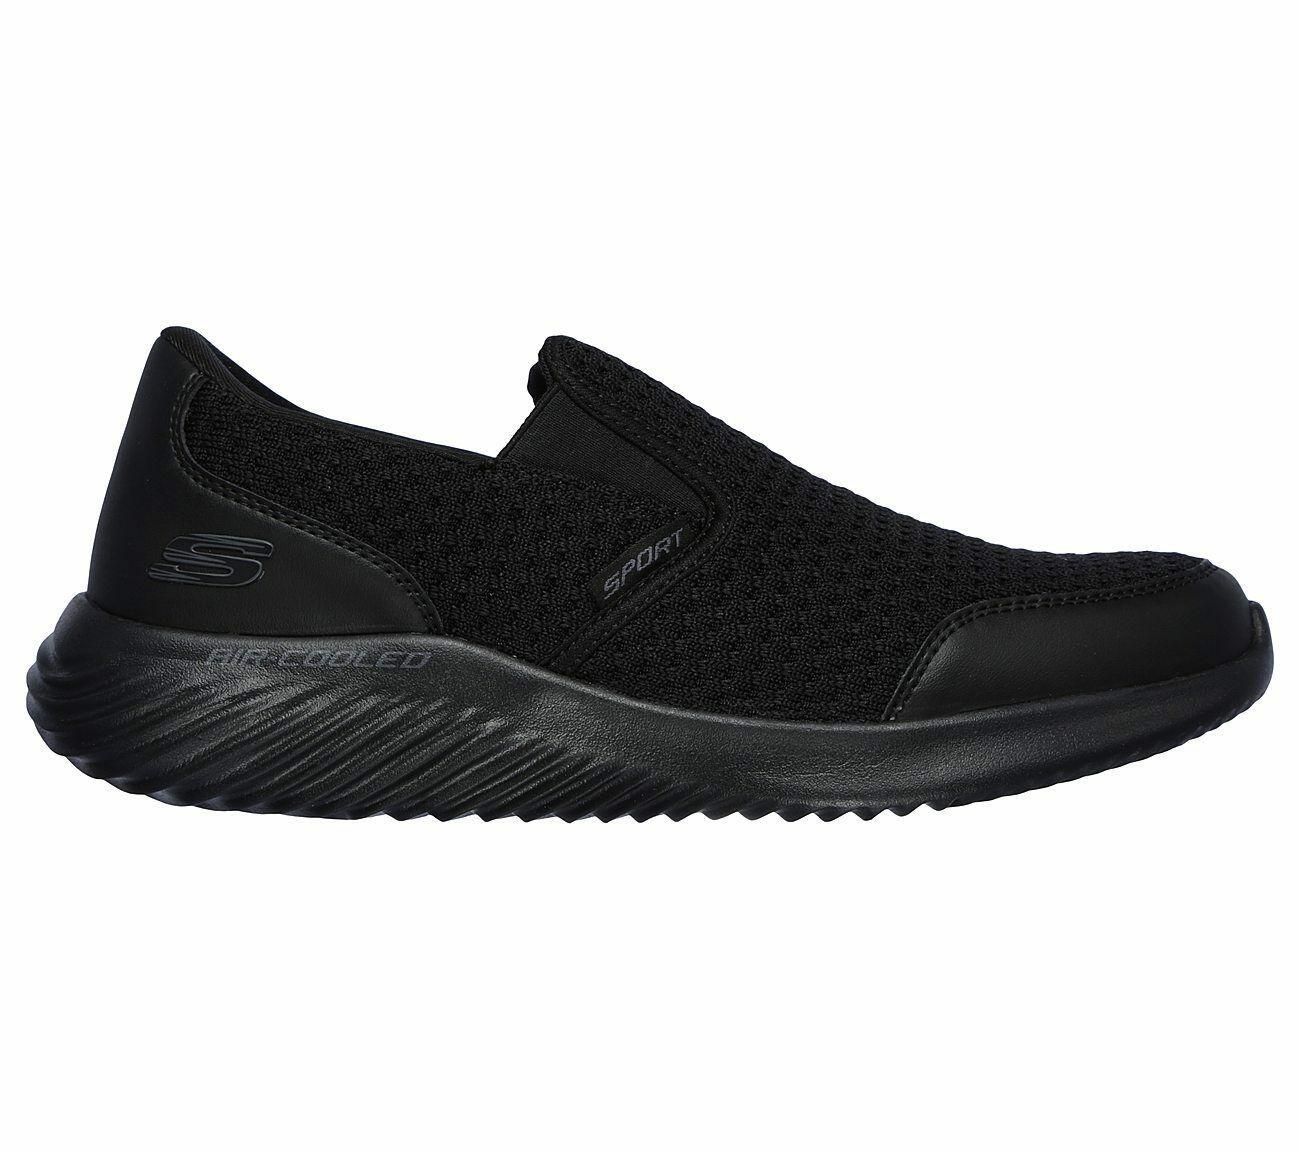 Skechers Black shoe Men Memory Foam Comfort Slip On Casual Mesh Sport Walk 52507